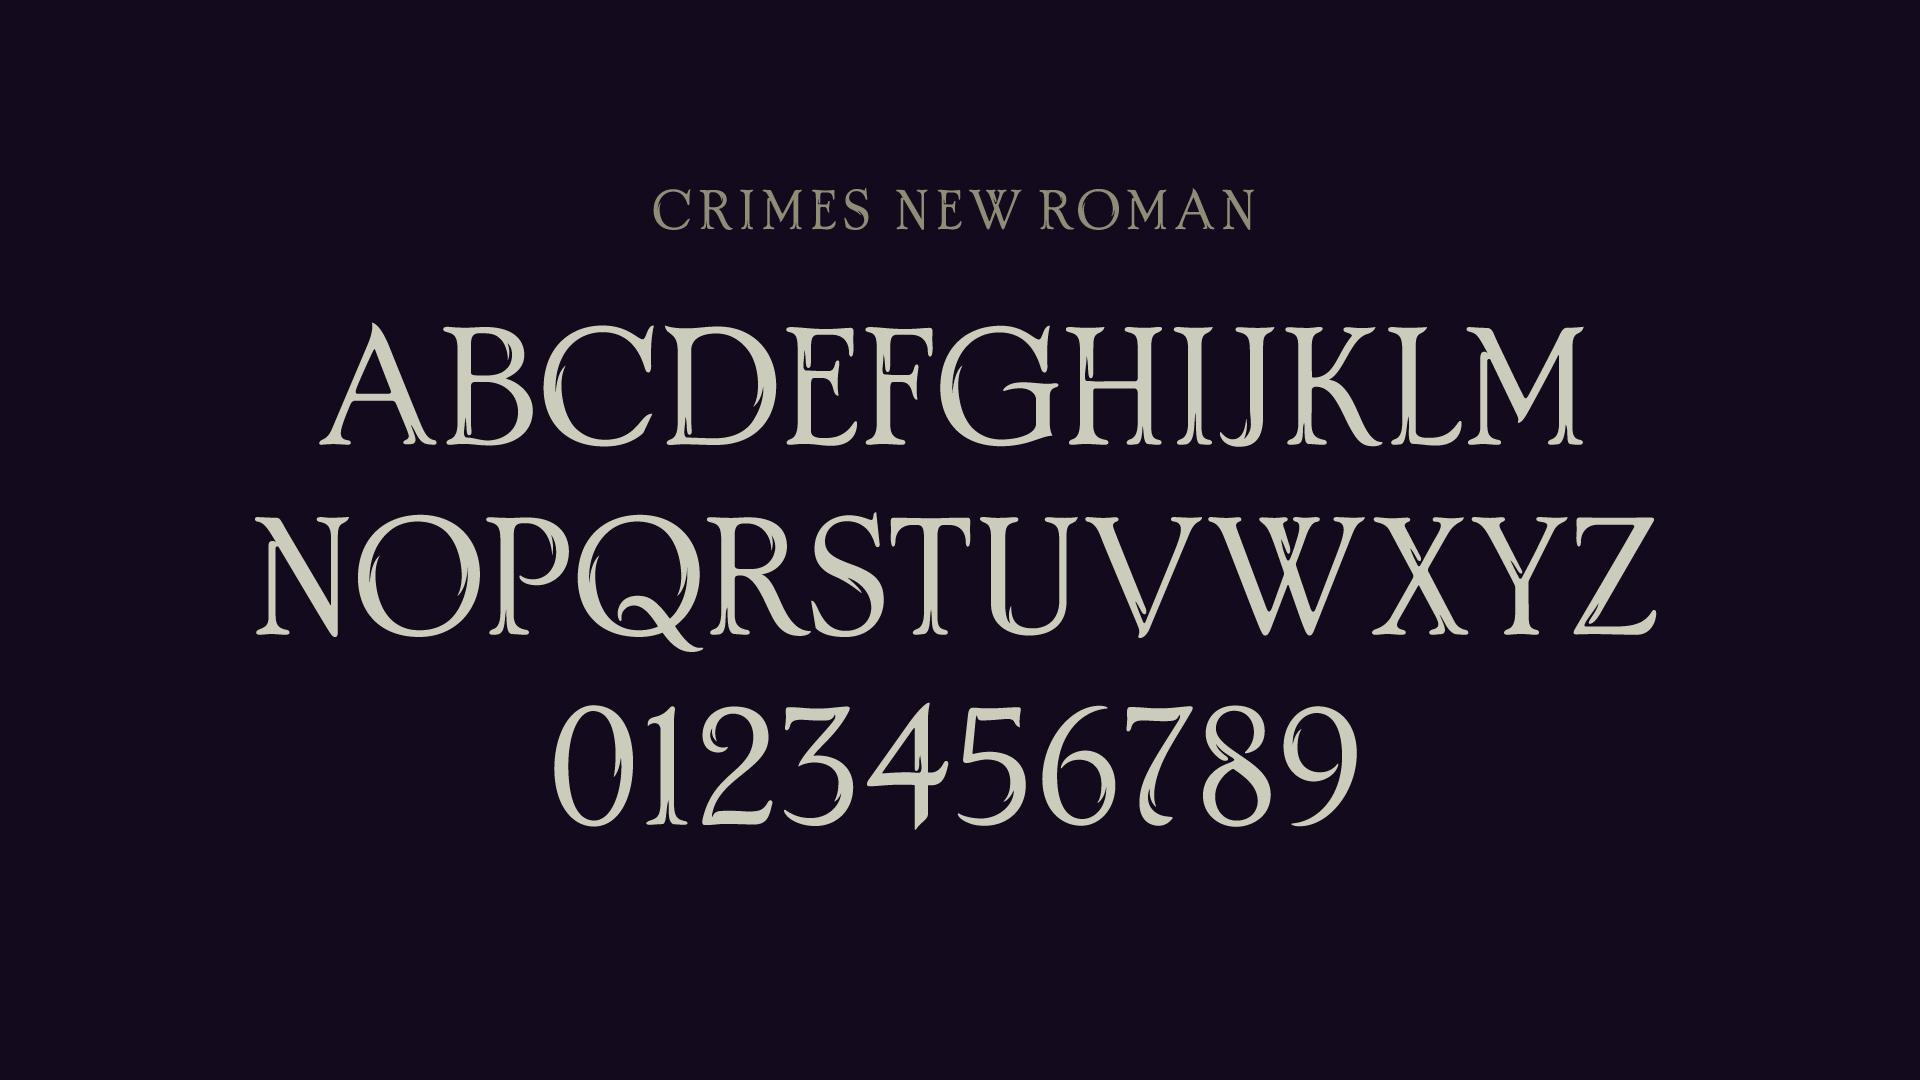 houtz_crimesofgrindelwald_crimesnewroman_clean.jpg